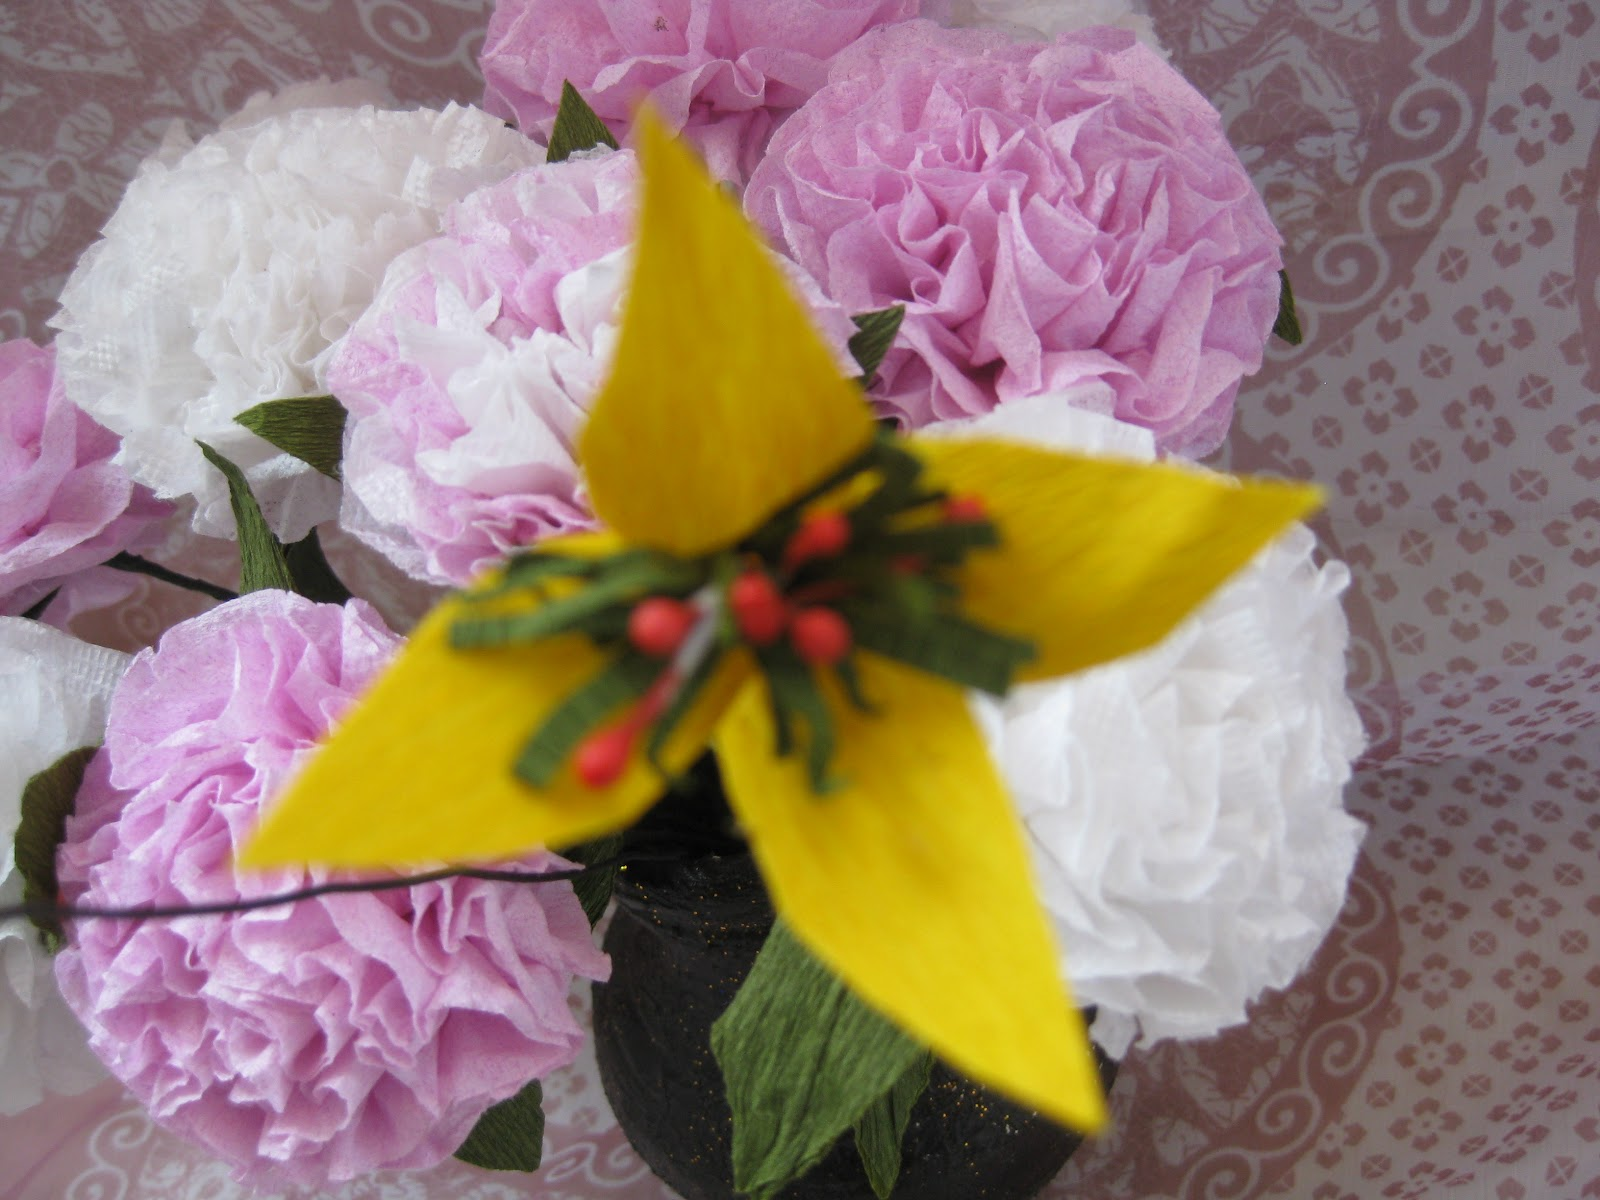 Himaja S Crafts Duplex Paper Or Creap Paper Flowers